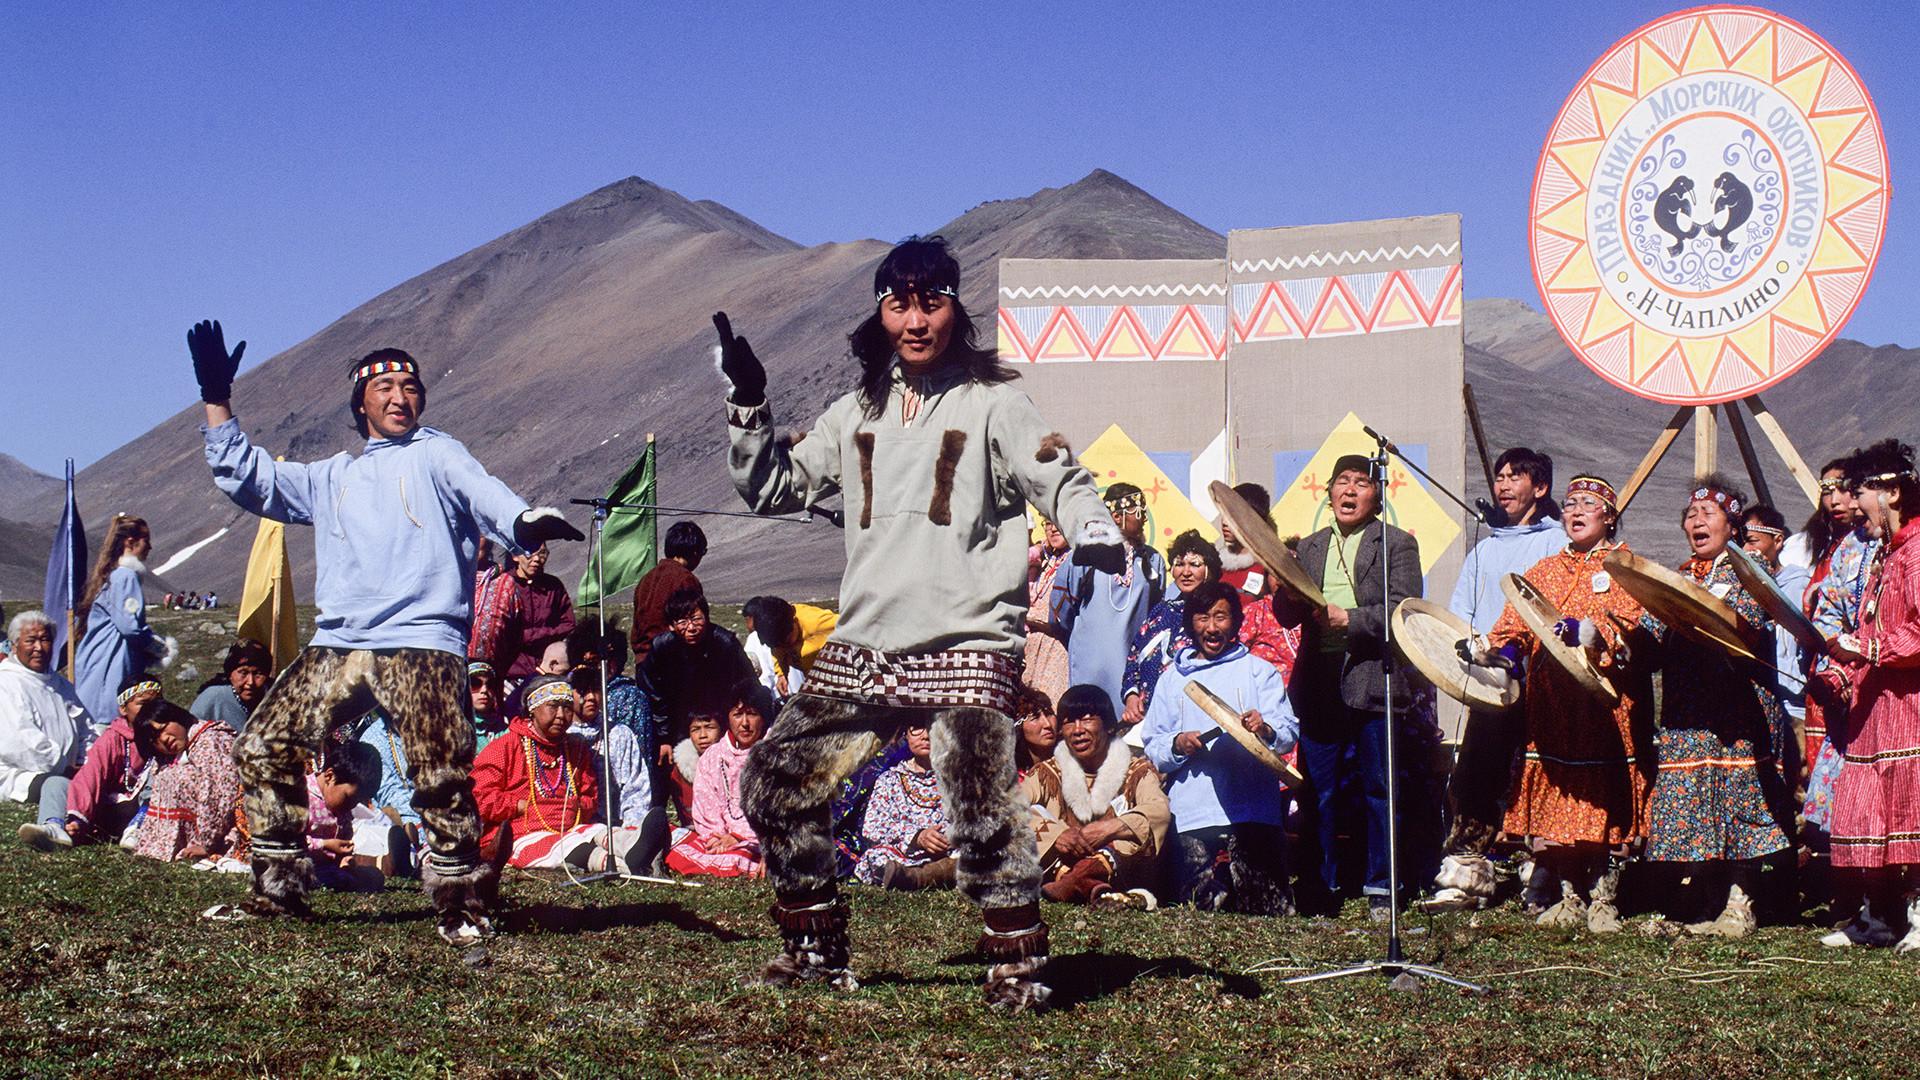 Orang eskimo menarikan tarian tradisional pada festival pemburu di Magadanskaya Oblast, Chukotskiy, Novoye Chaplino.